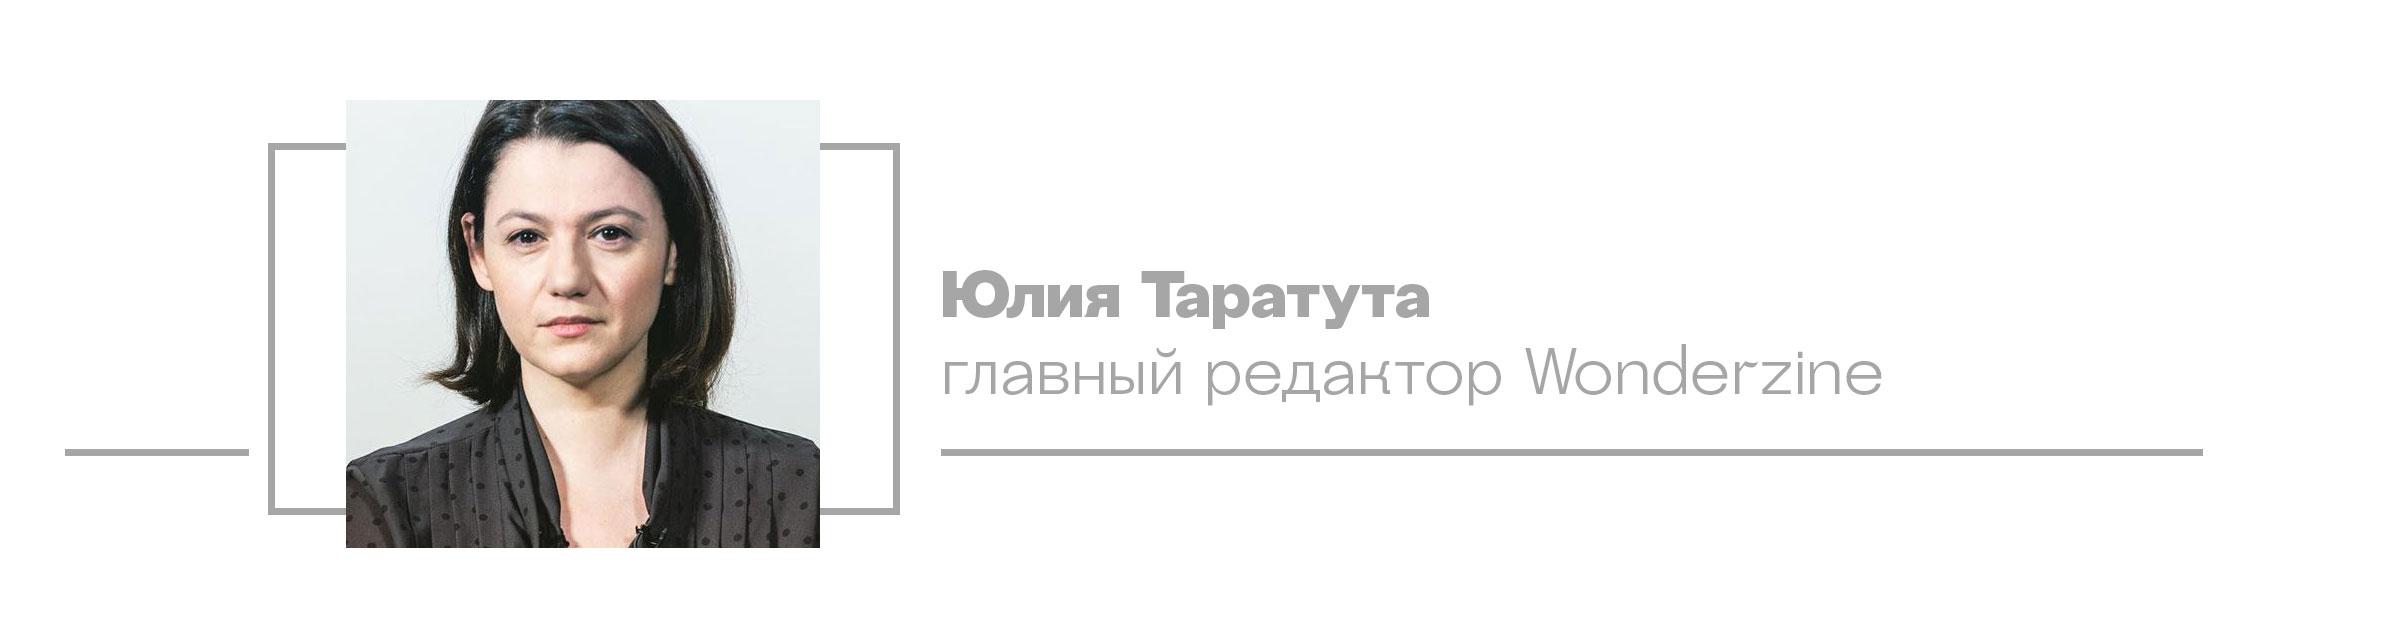 Юлия Таратута, главный редактор Wonderzine